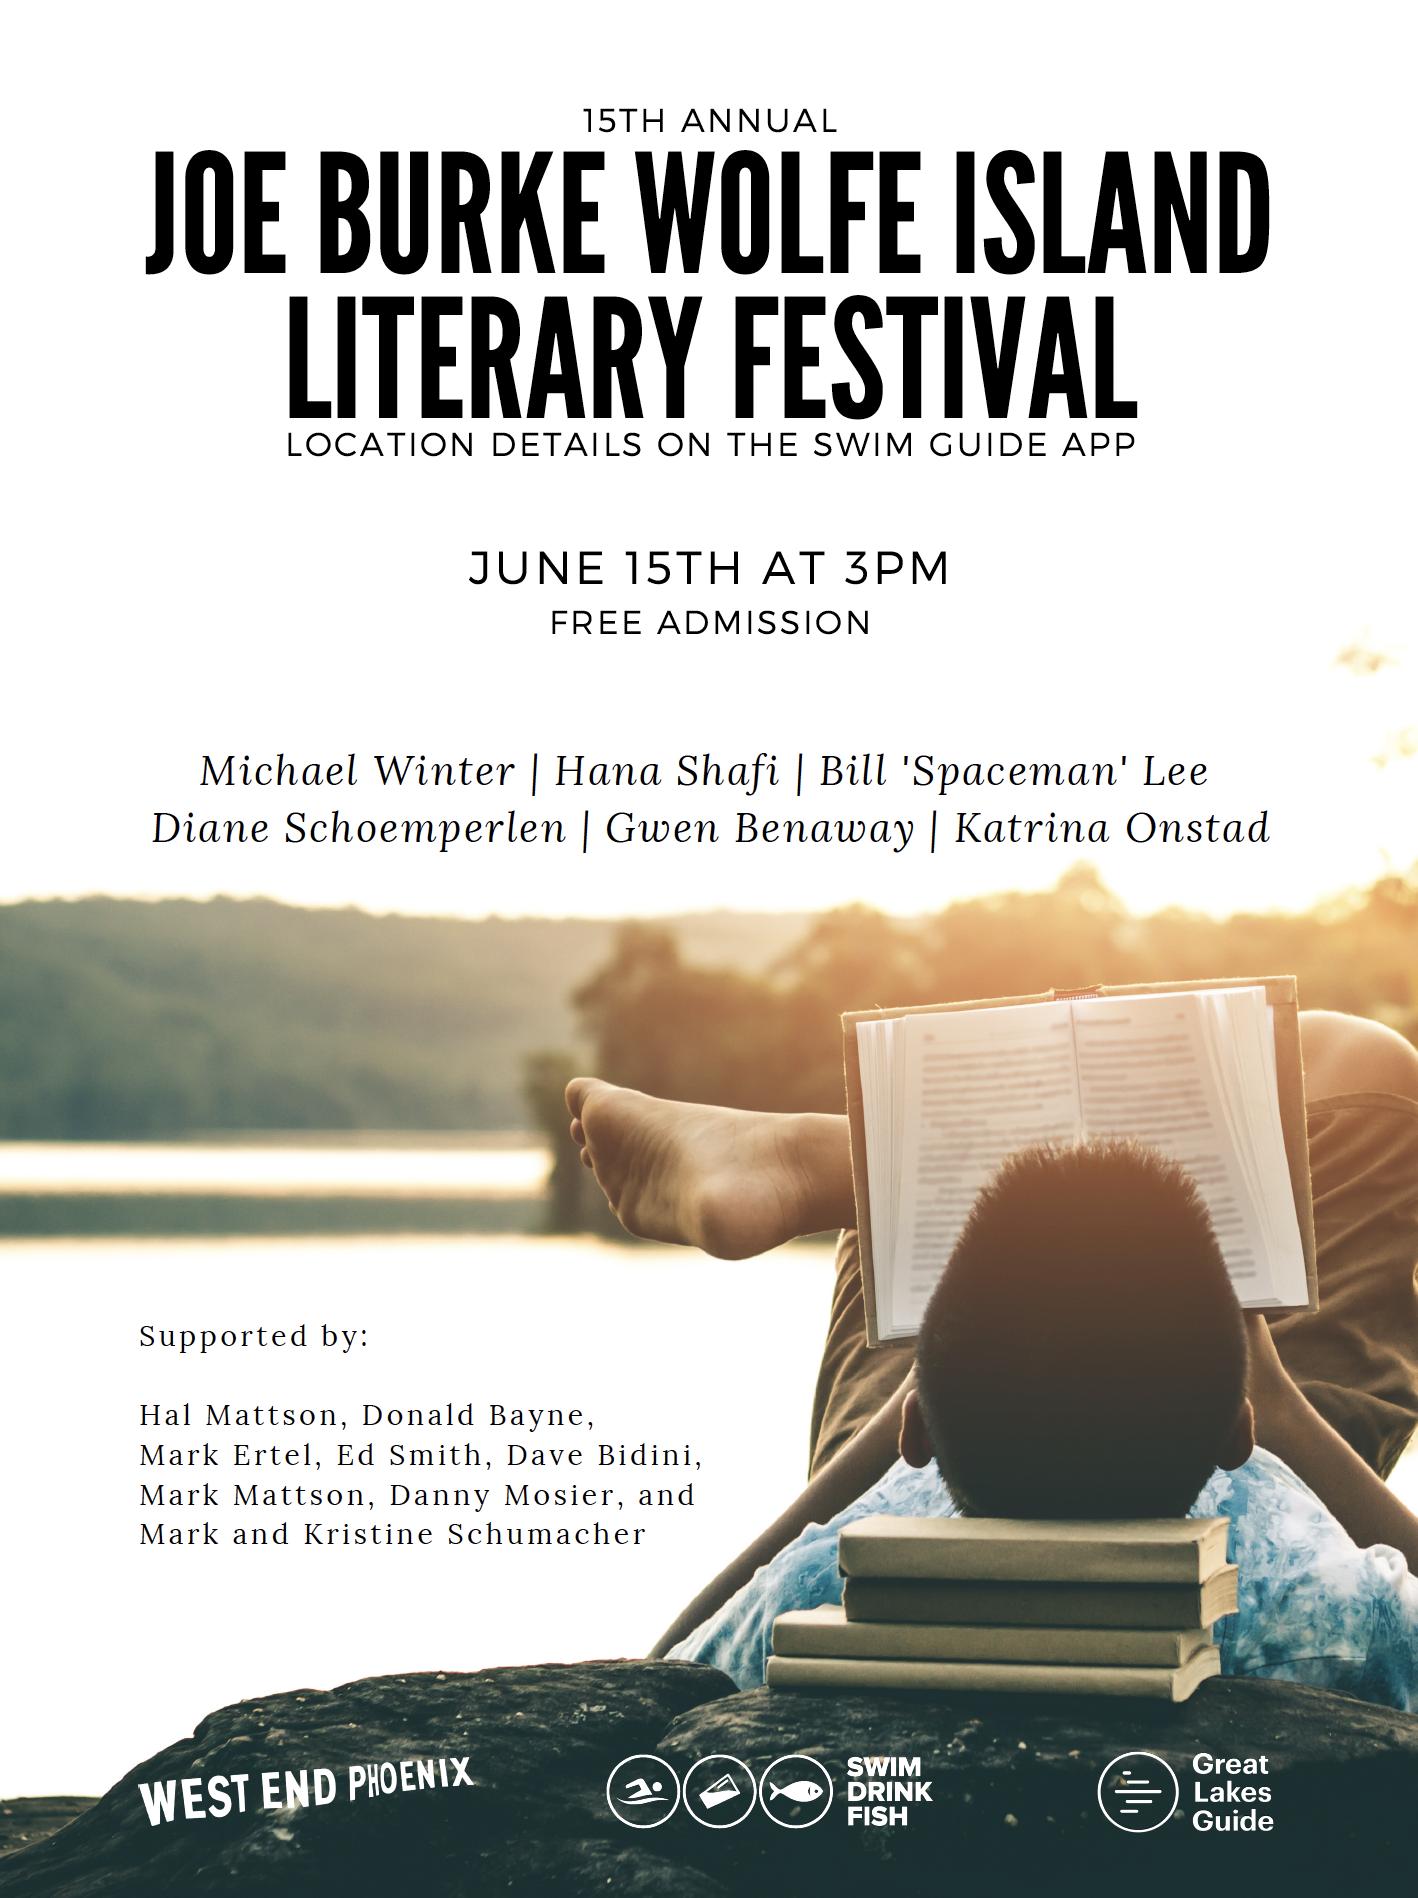 15th Annual Joe Burke Wolfe Island Literary Festival - Lake Ontario Waterkeeper - West End Phoenix - Swim Drink Fish - Kingston